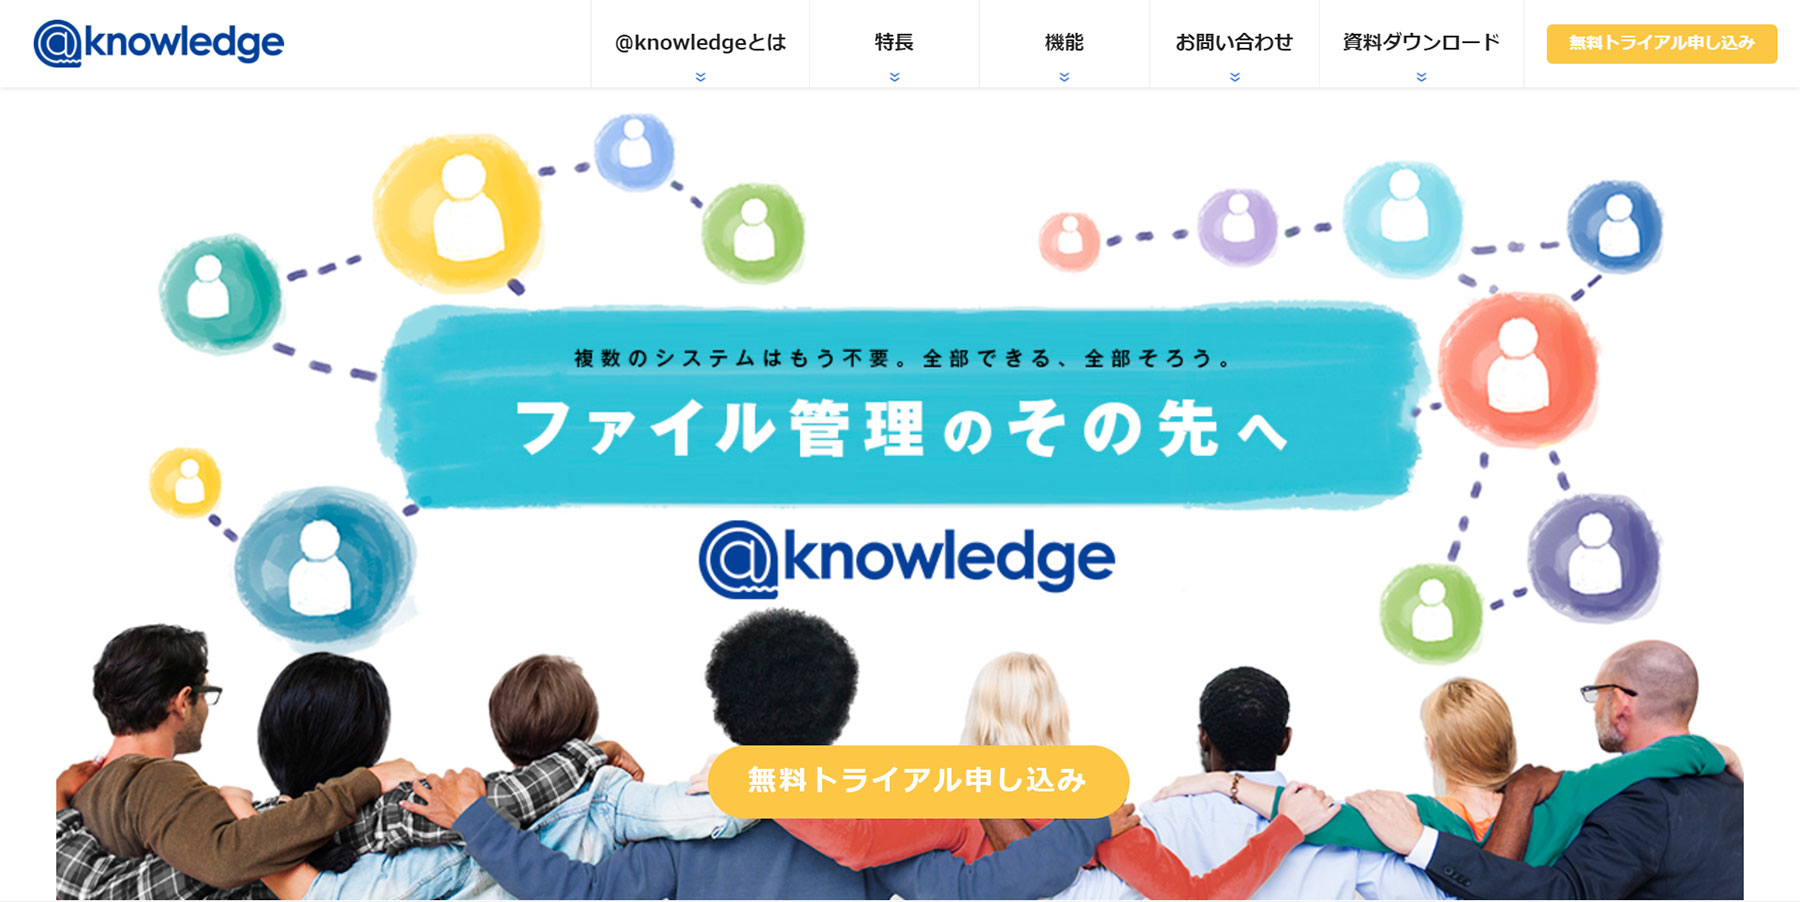 @knowledge